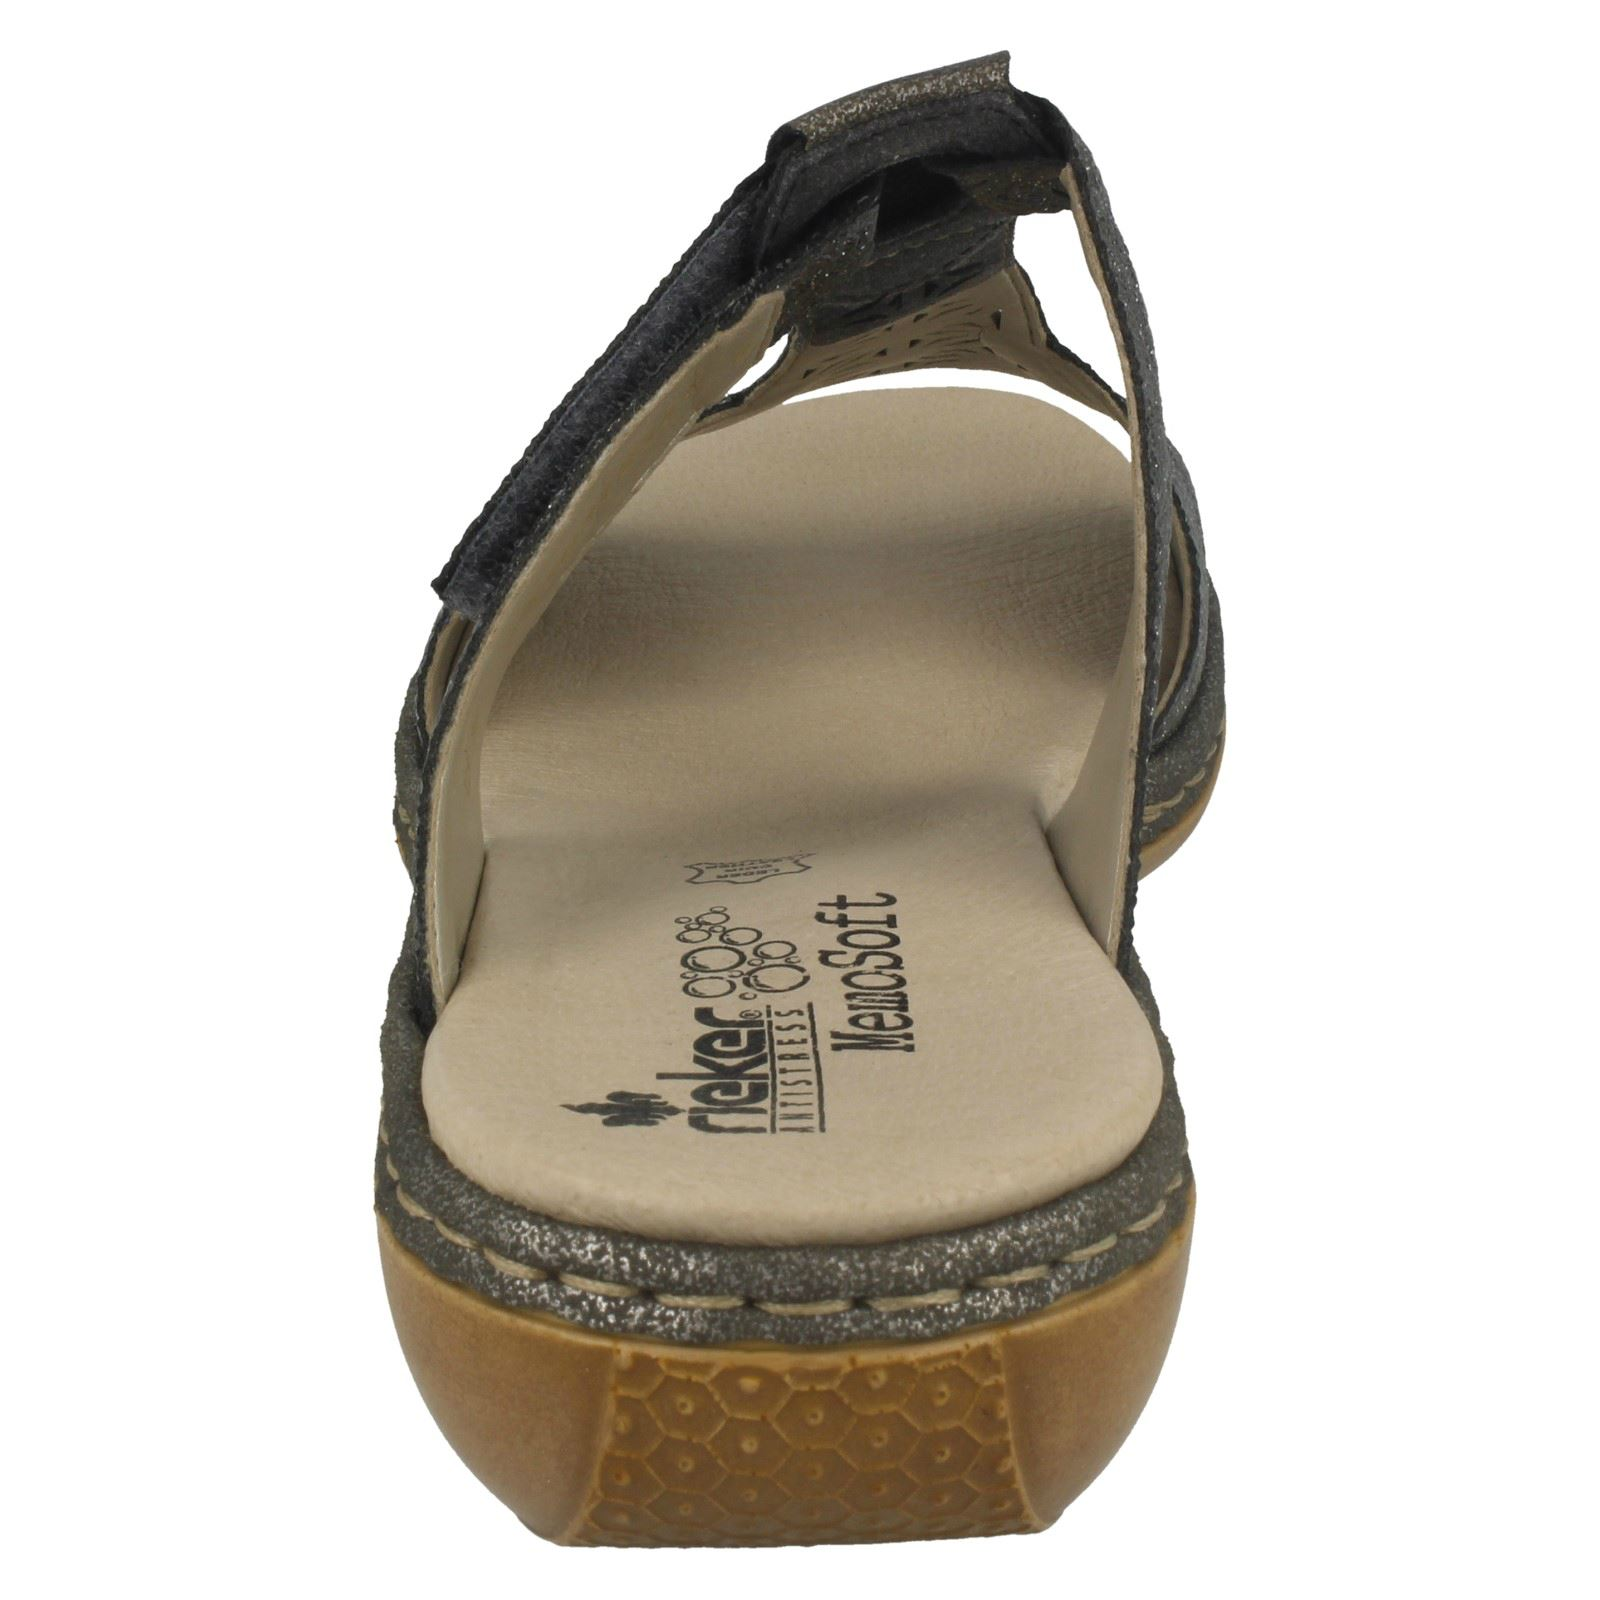 Diamante Loop Out platino Open Argento Toe Sandali Cut Hook Ladies sintetici Rieker 65950 argento nx4STwqa